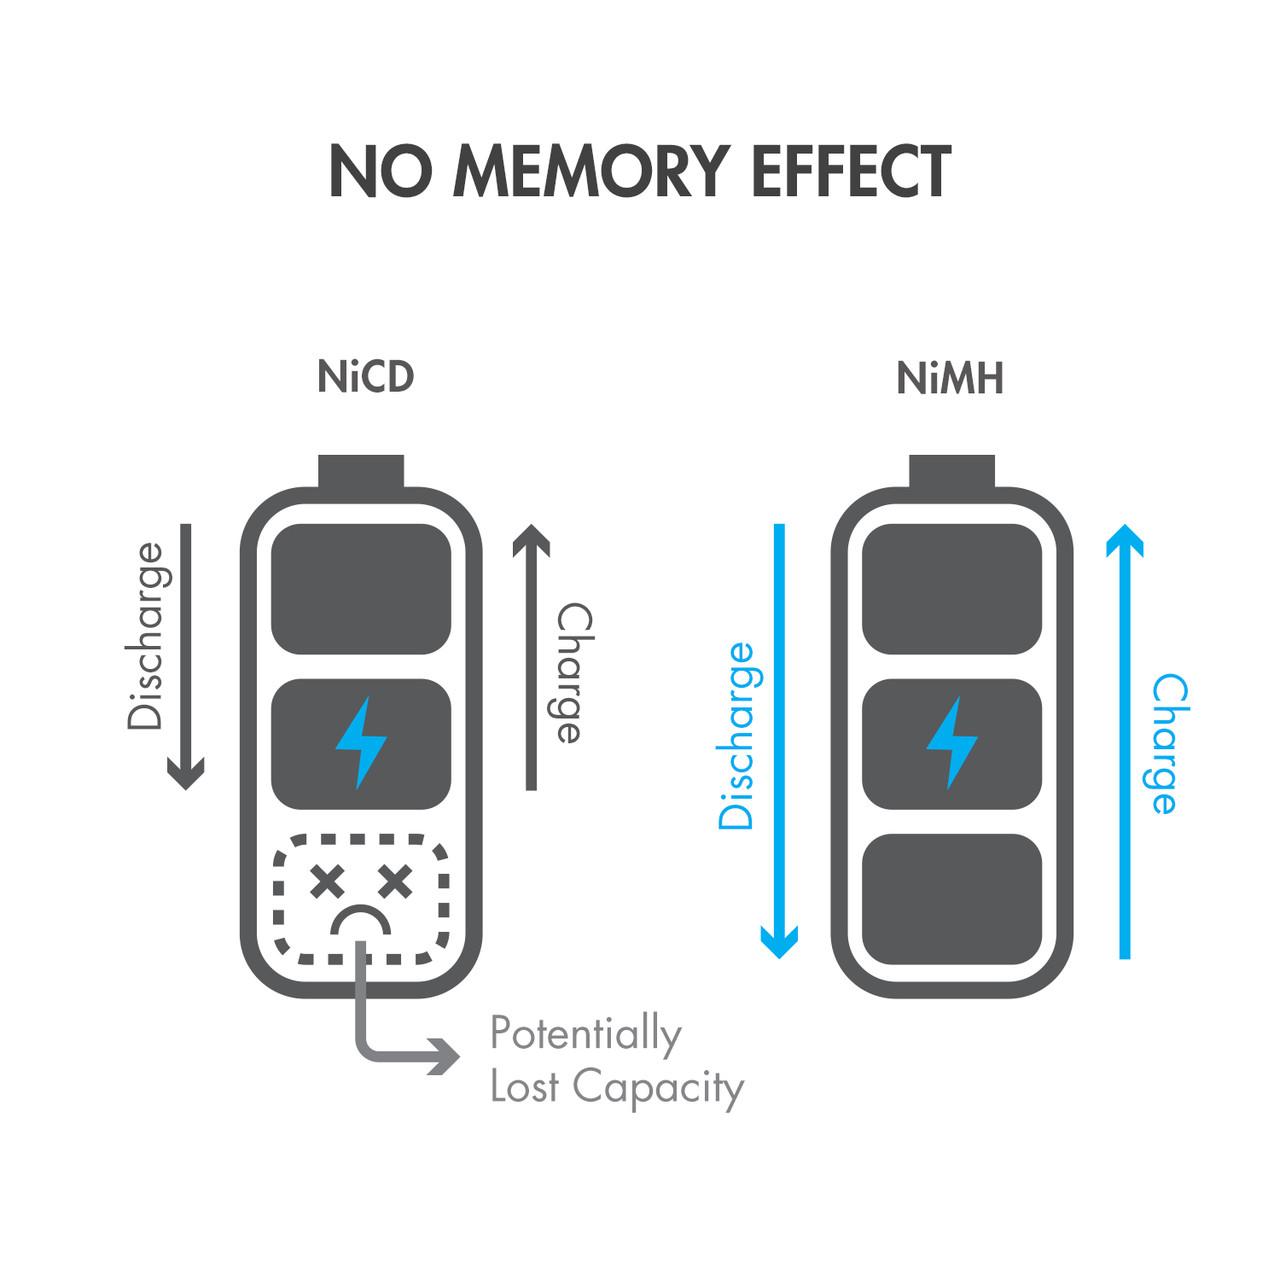 10pcs Tenergy Propel Sub C 4200mAh NiMH Flat Top Rechargeable Batteries